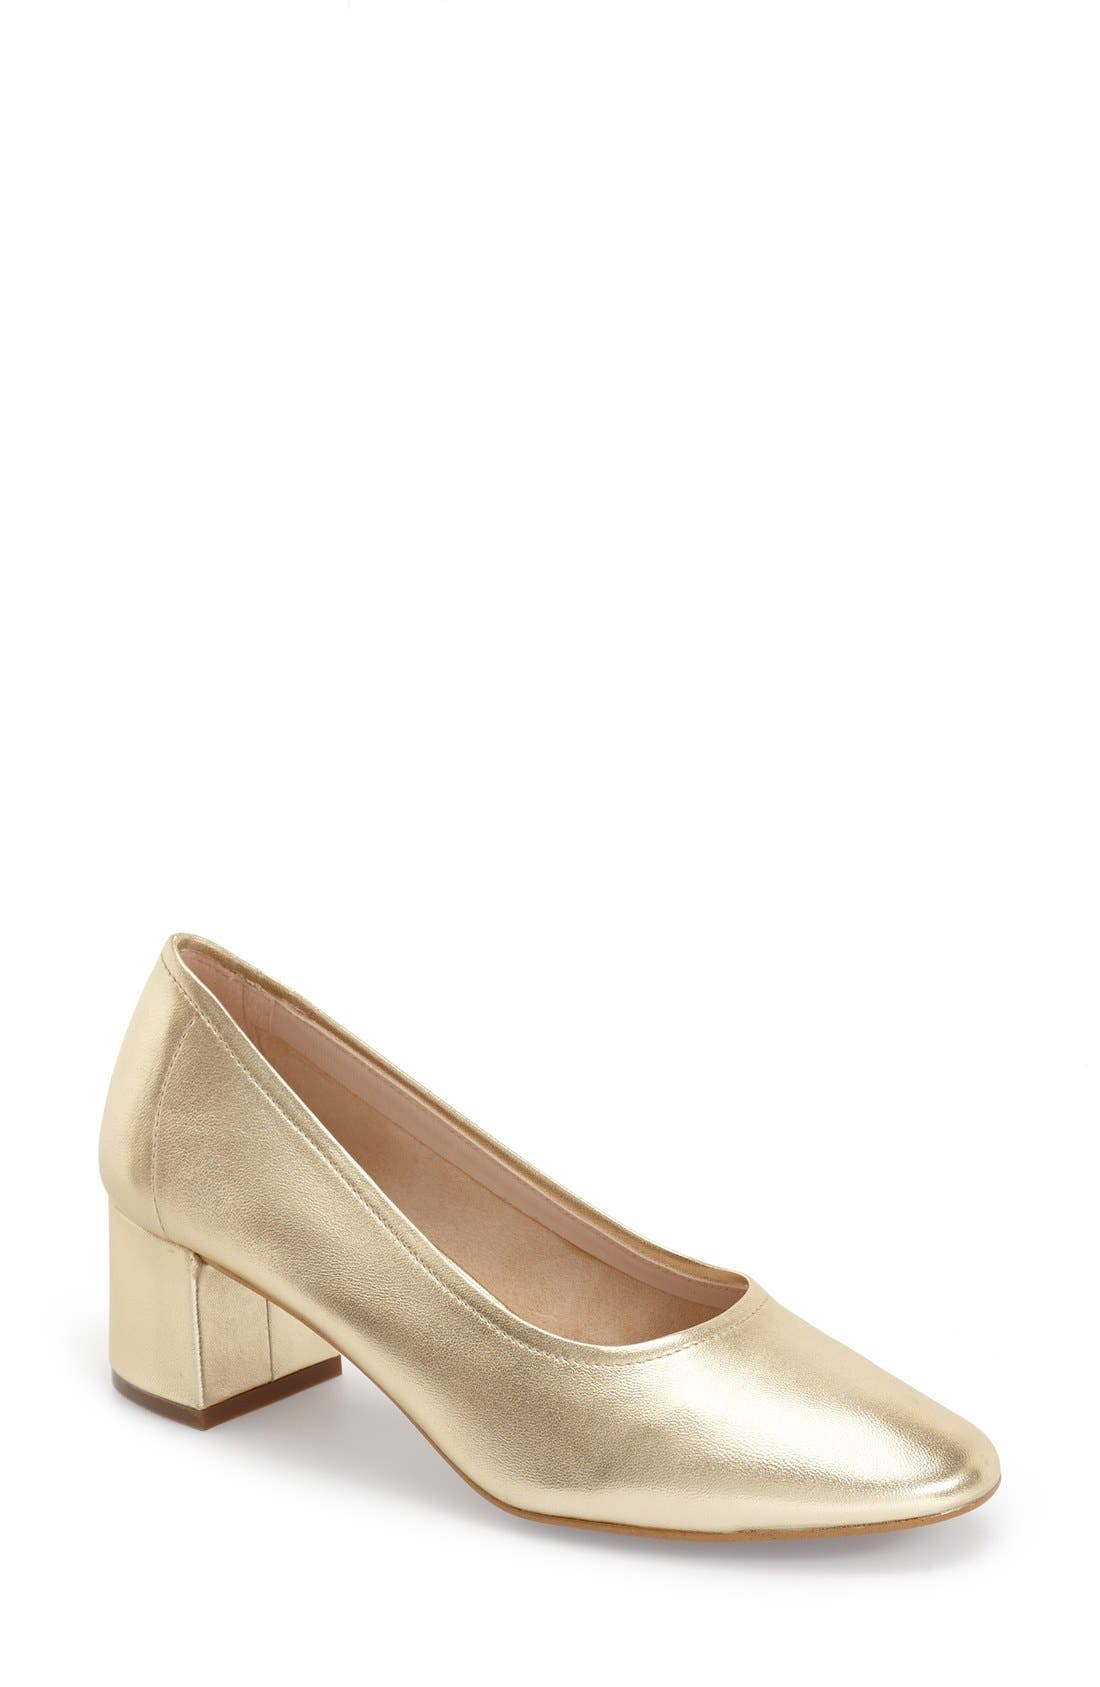 TOPSHOP 'Juno' Ballet Shoe